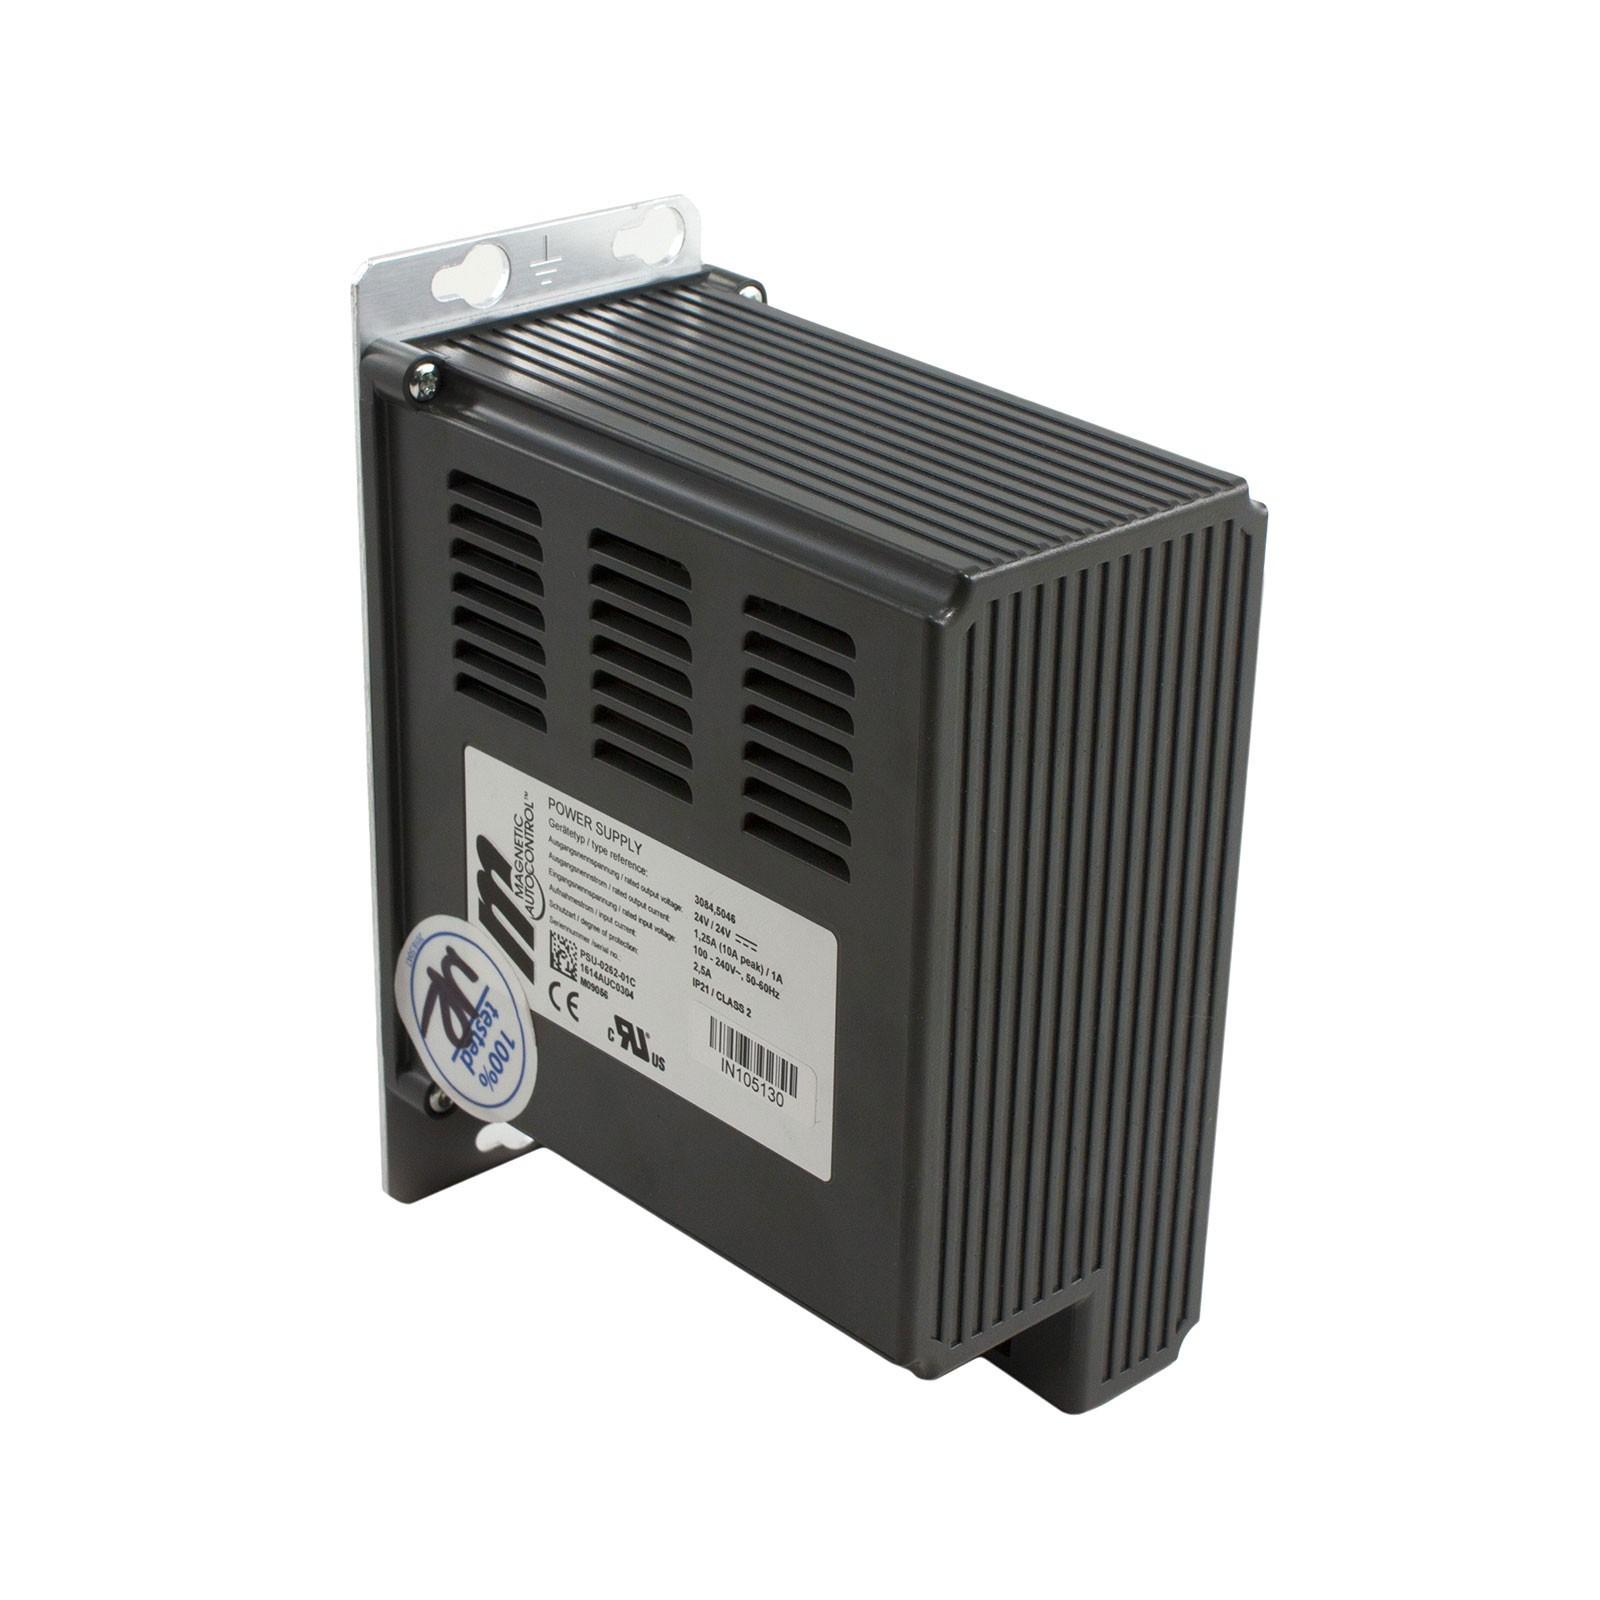 Magnetic Autocontrol Microdrive Ul Power Supply 30845046 Powersupply